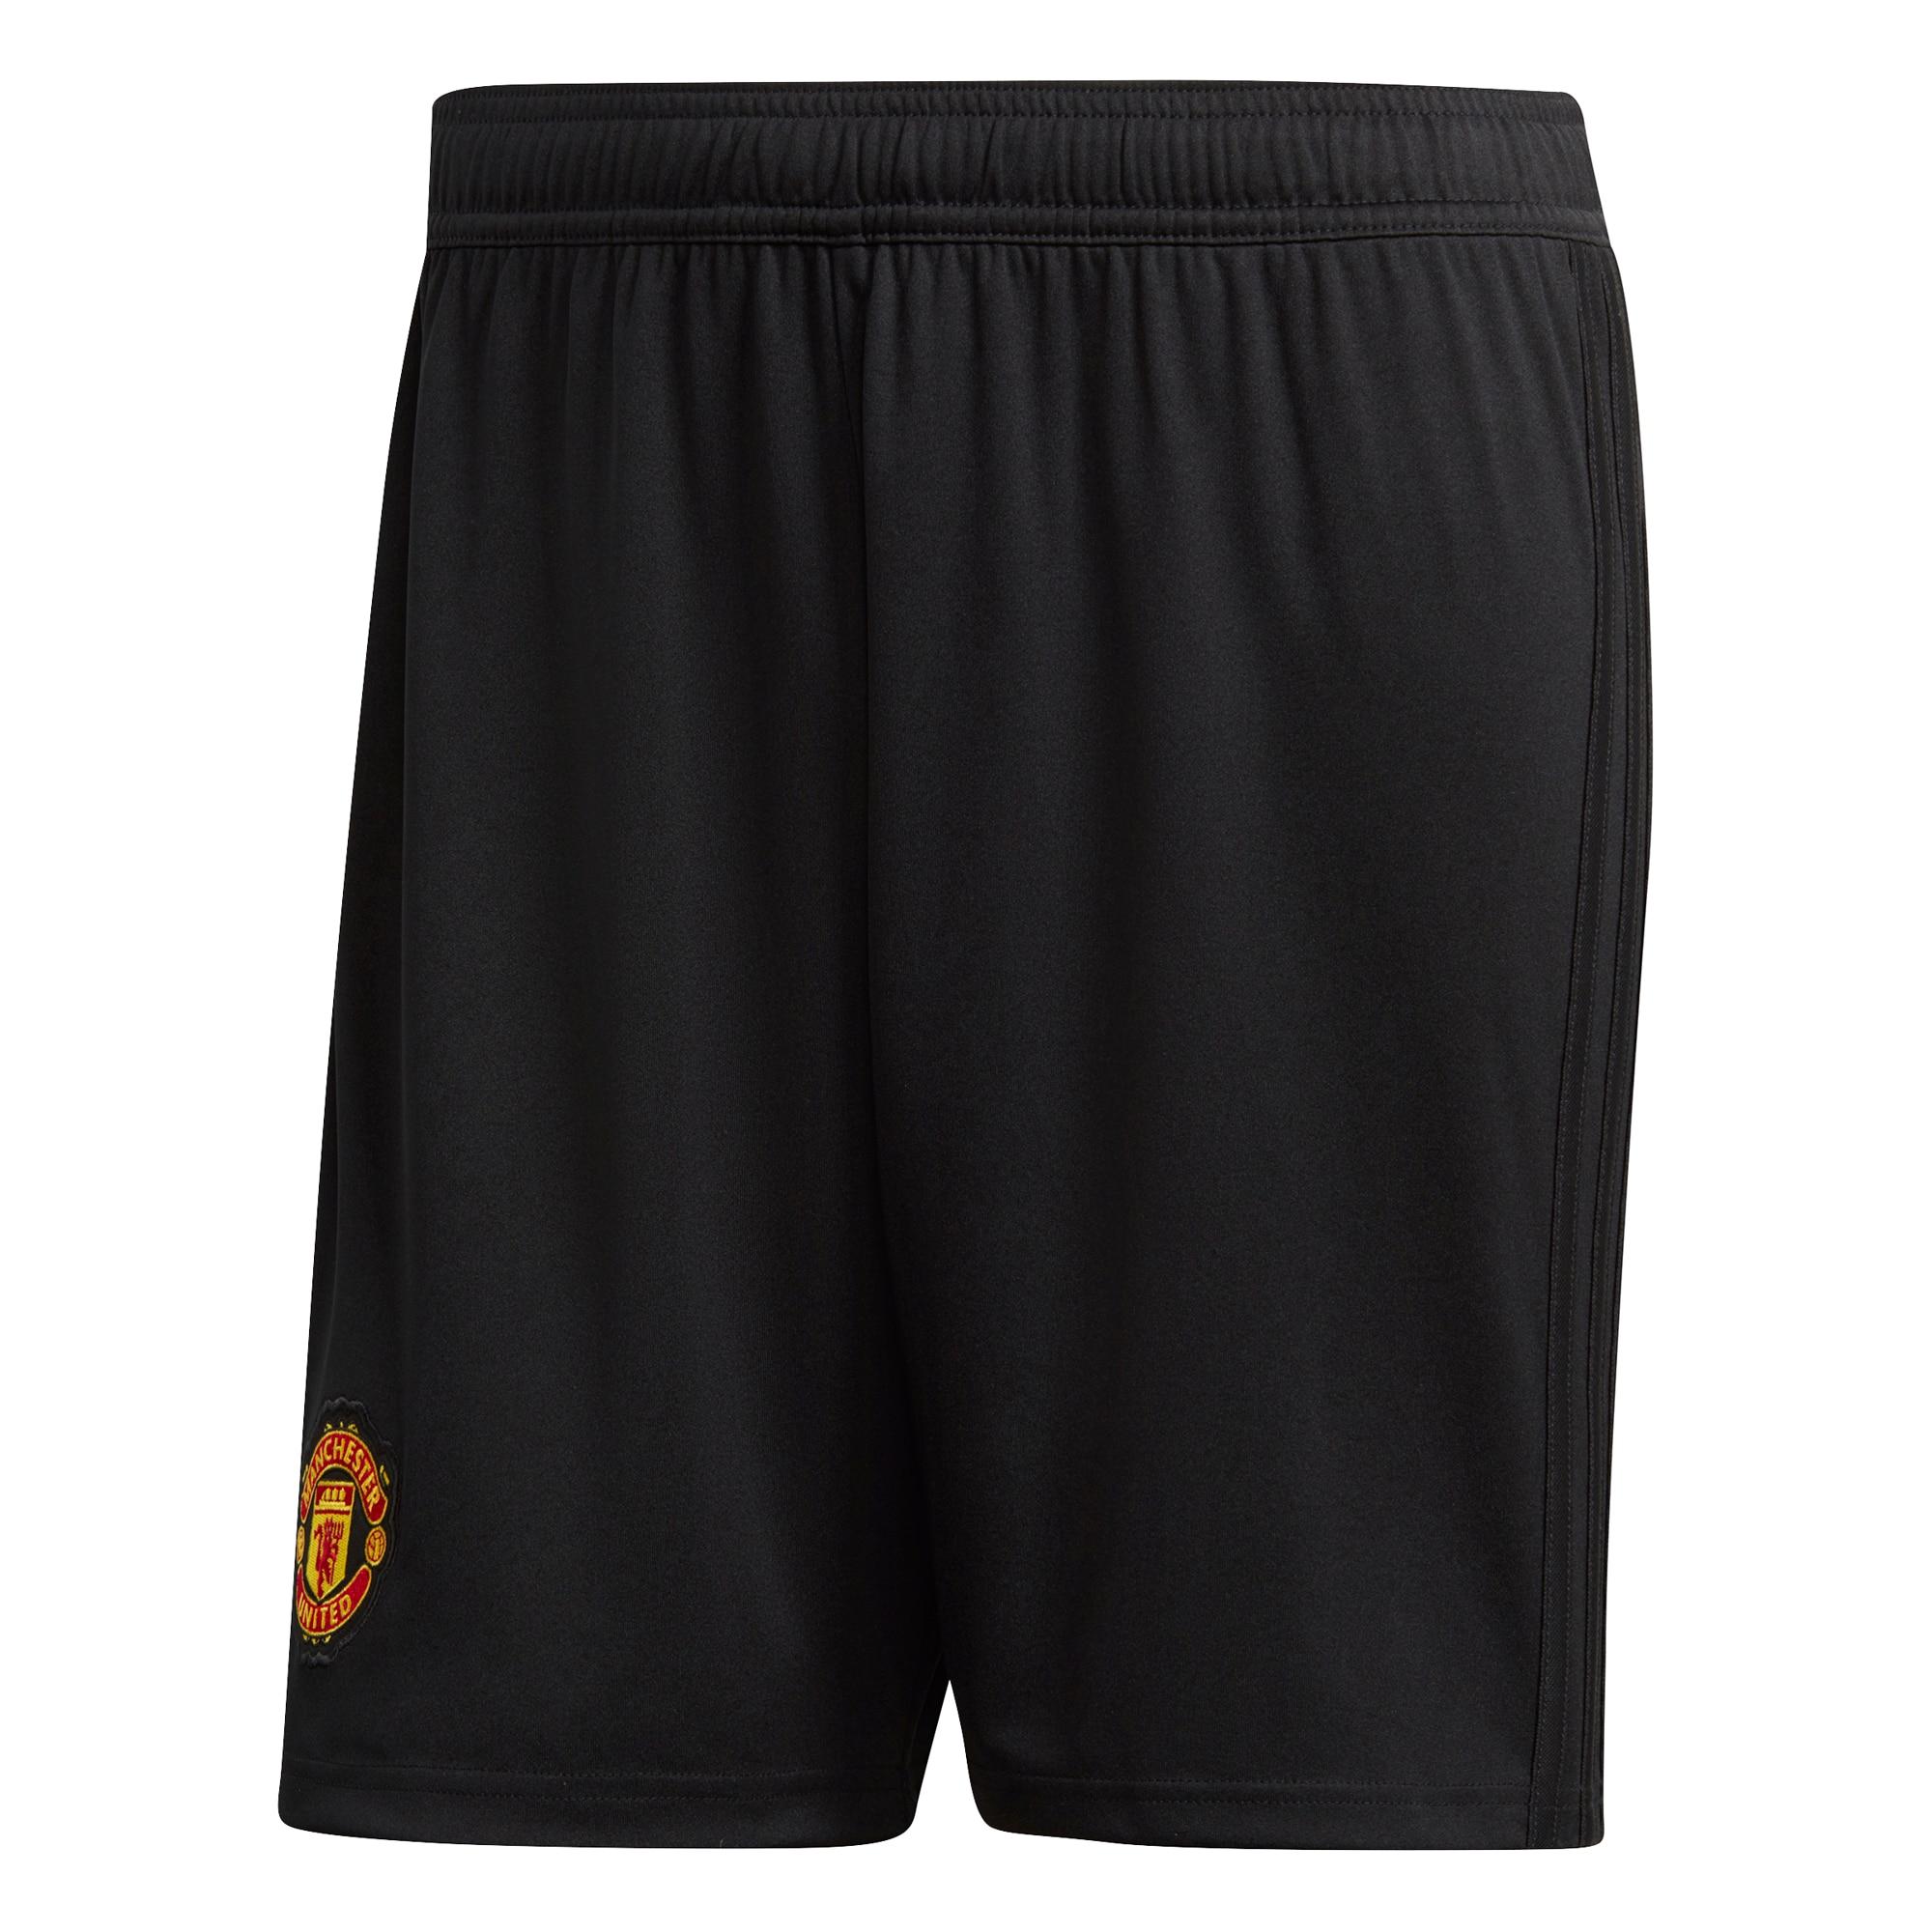 Adidas Manchester United Fotballshorts 18/19 Hjemme